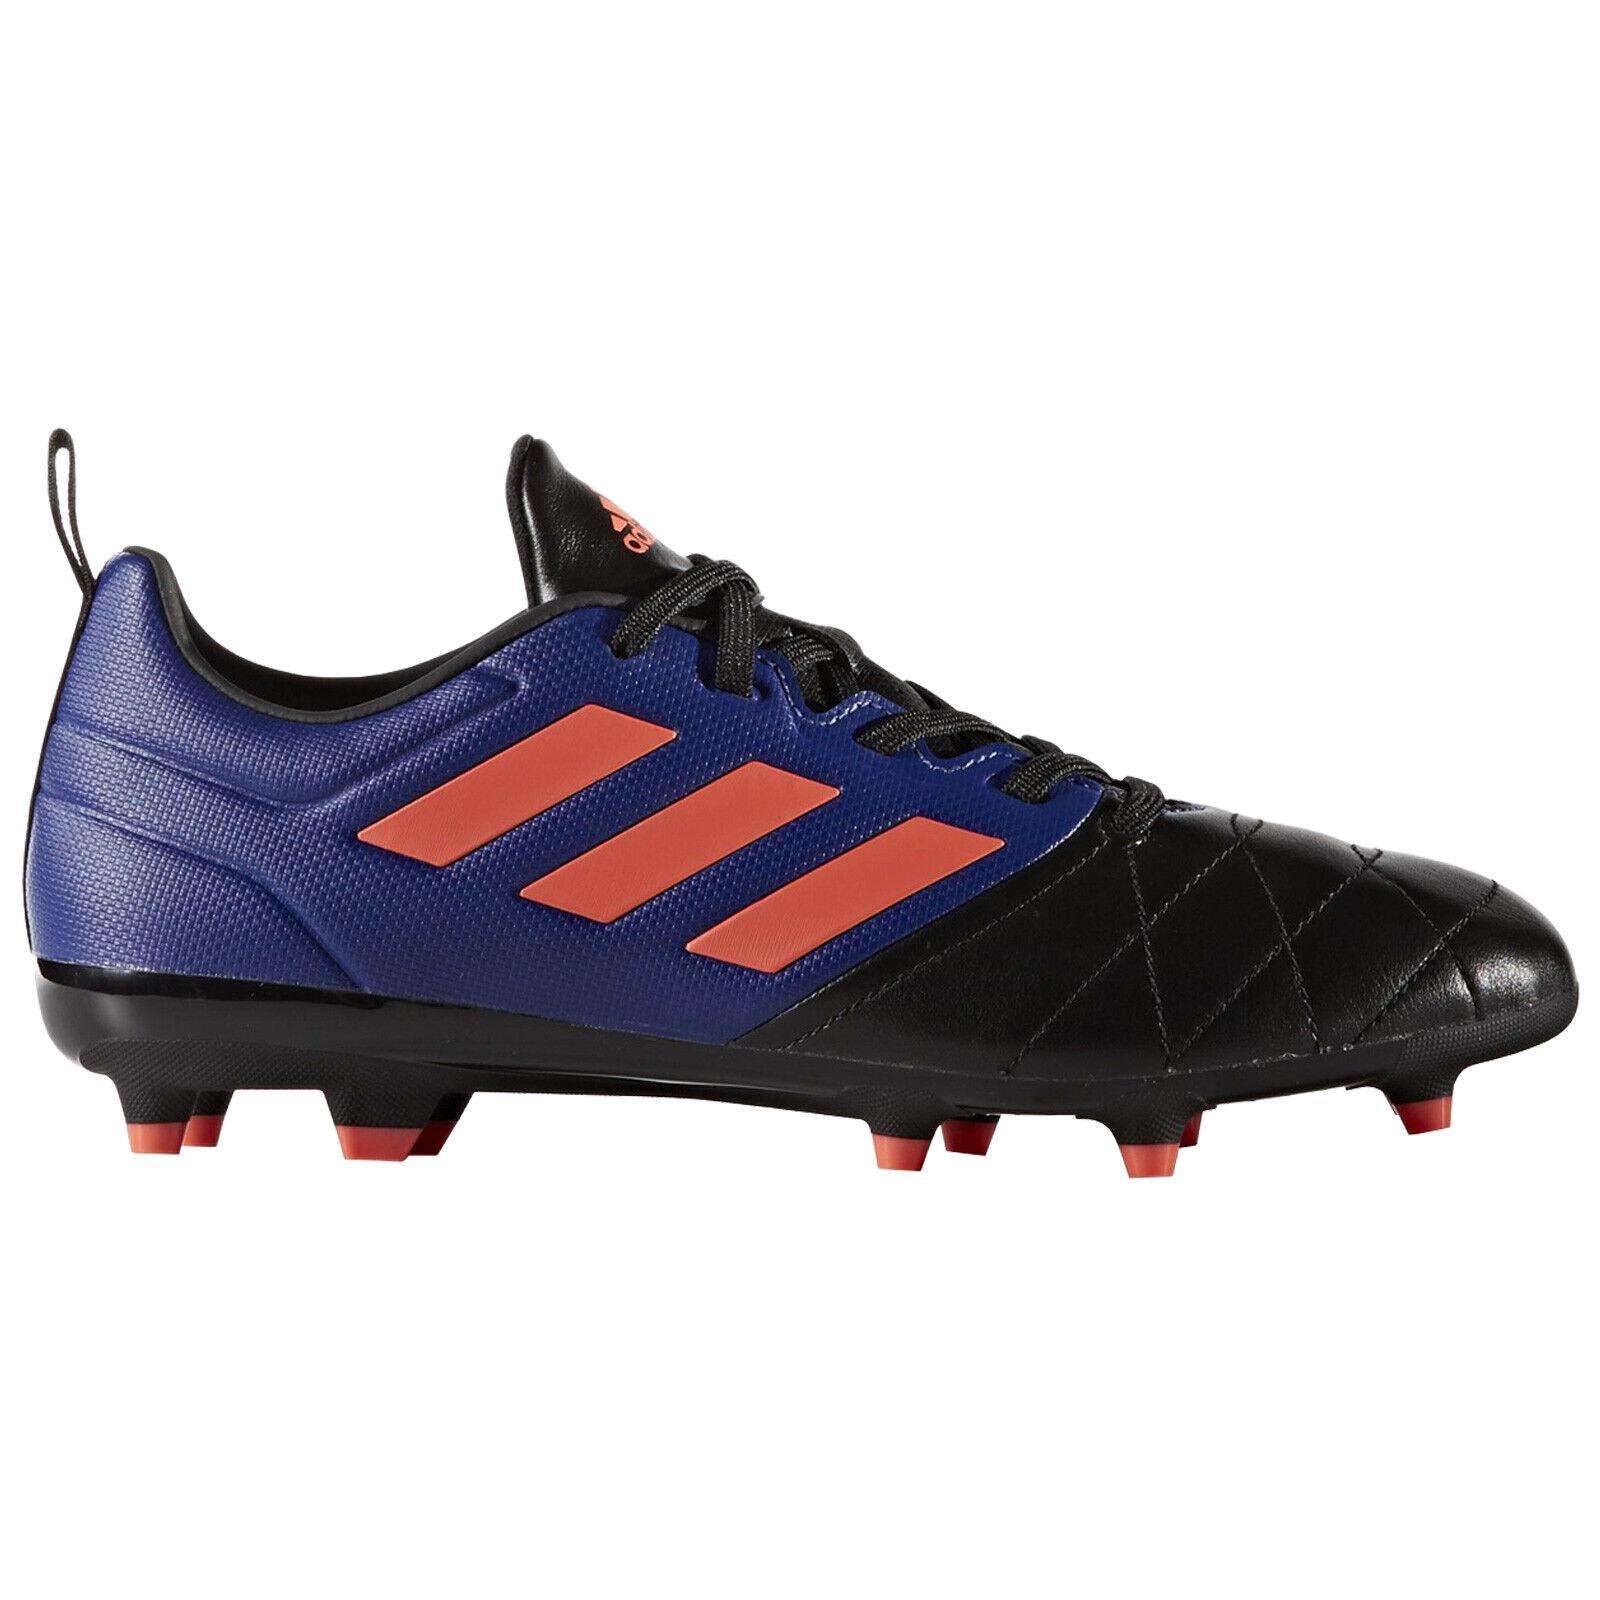 Adidas Mujer Ace 17.3 botas Fútbol Suela Firme Deportivo Fg con Fútbol Zapatos